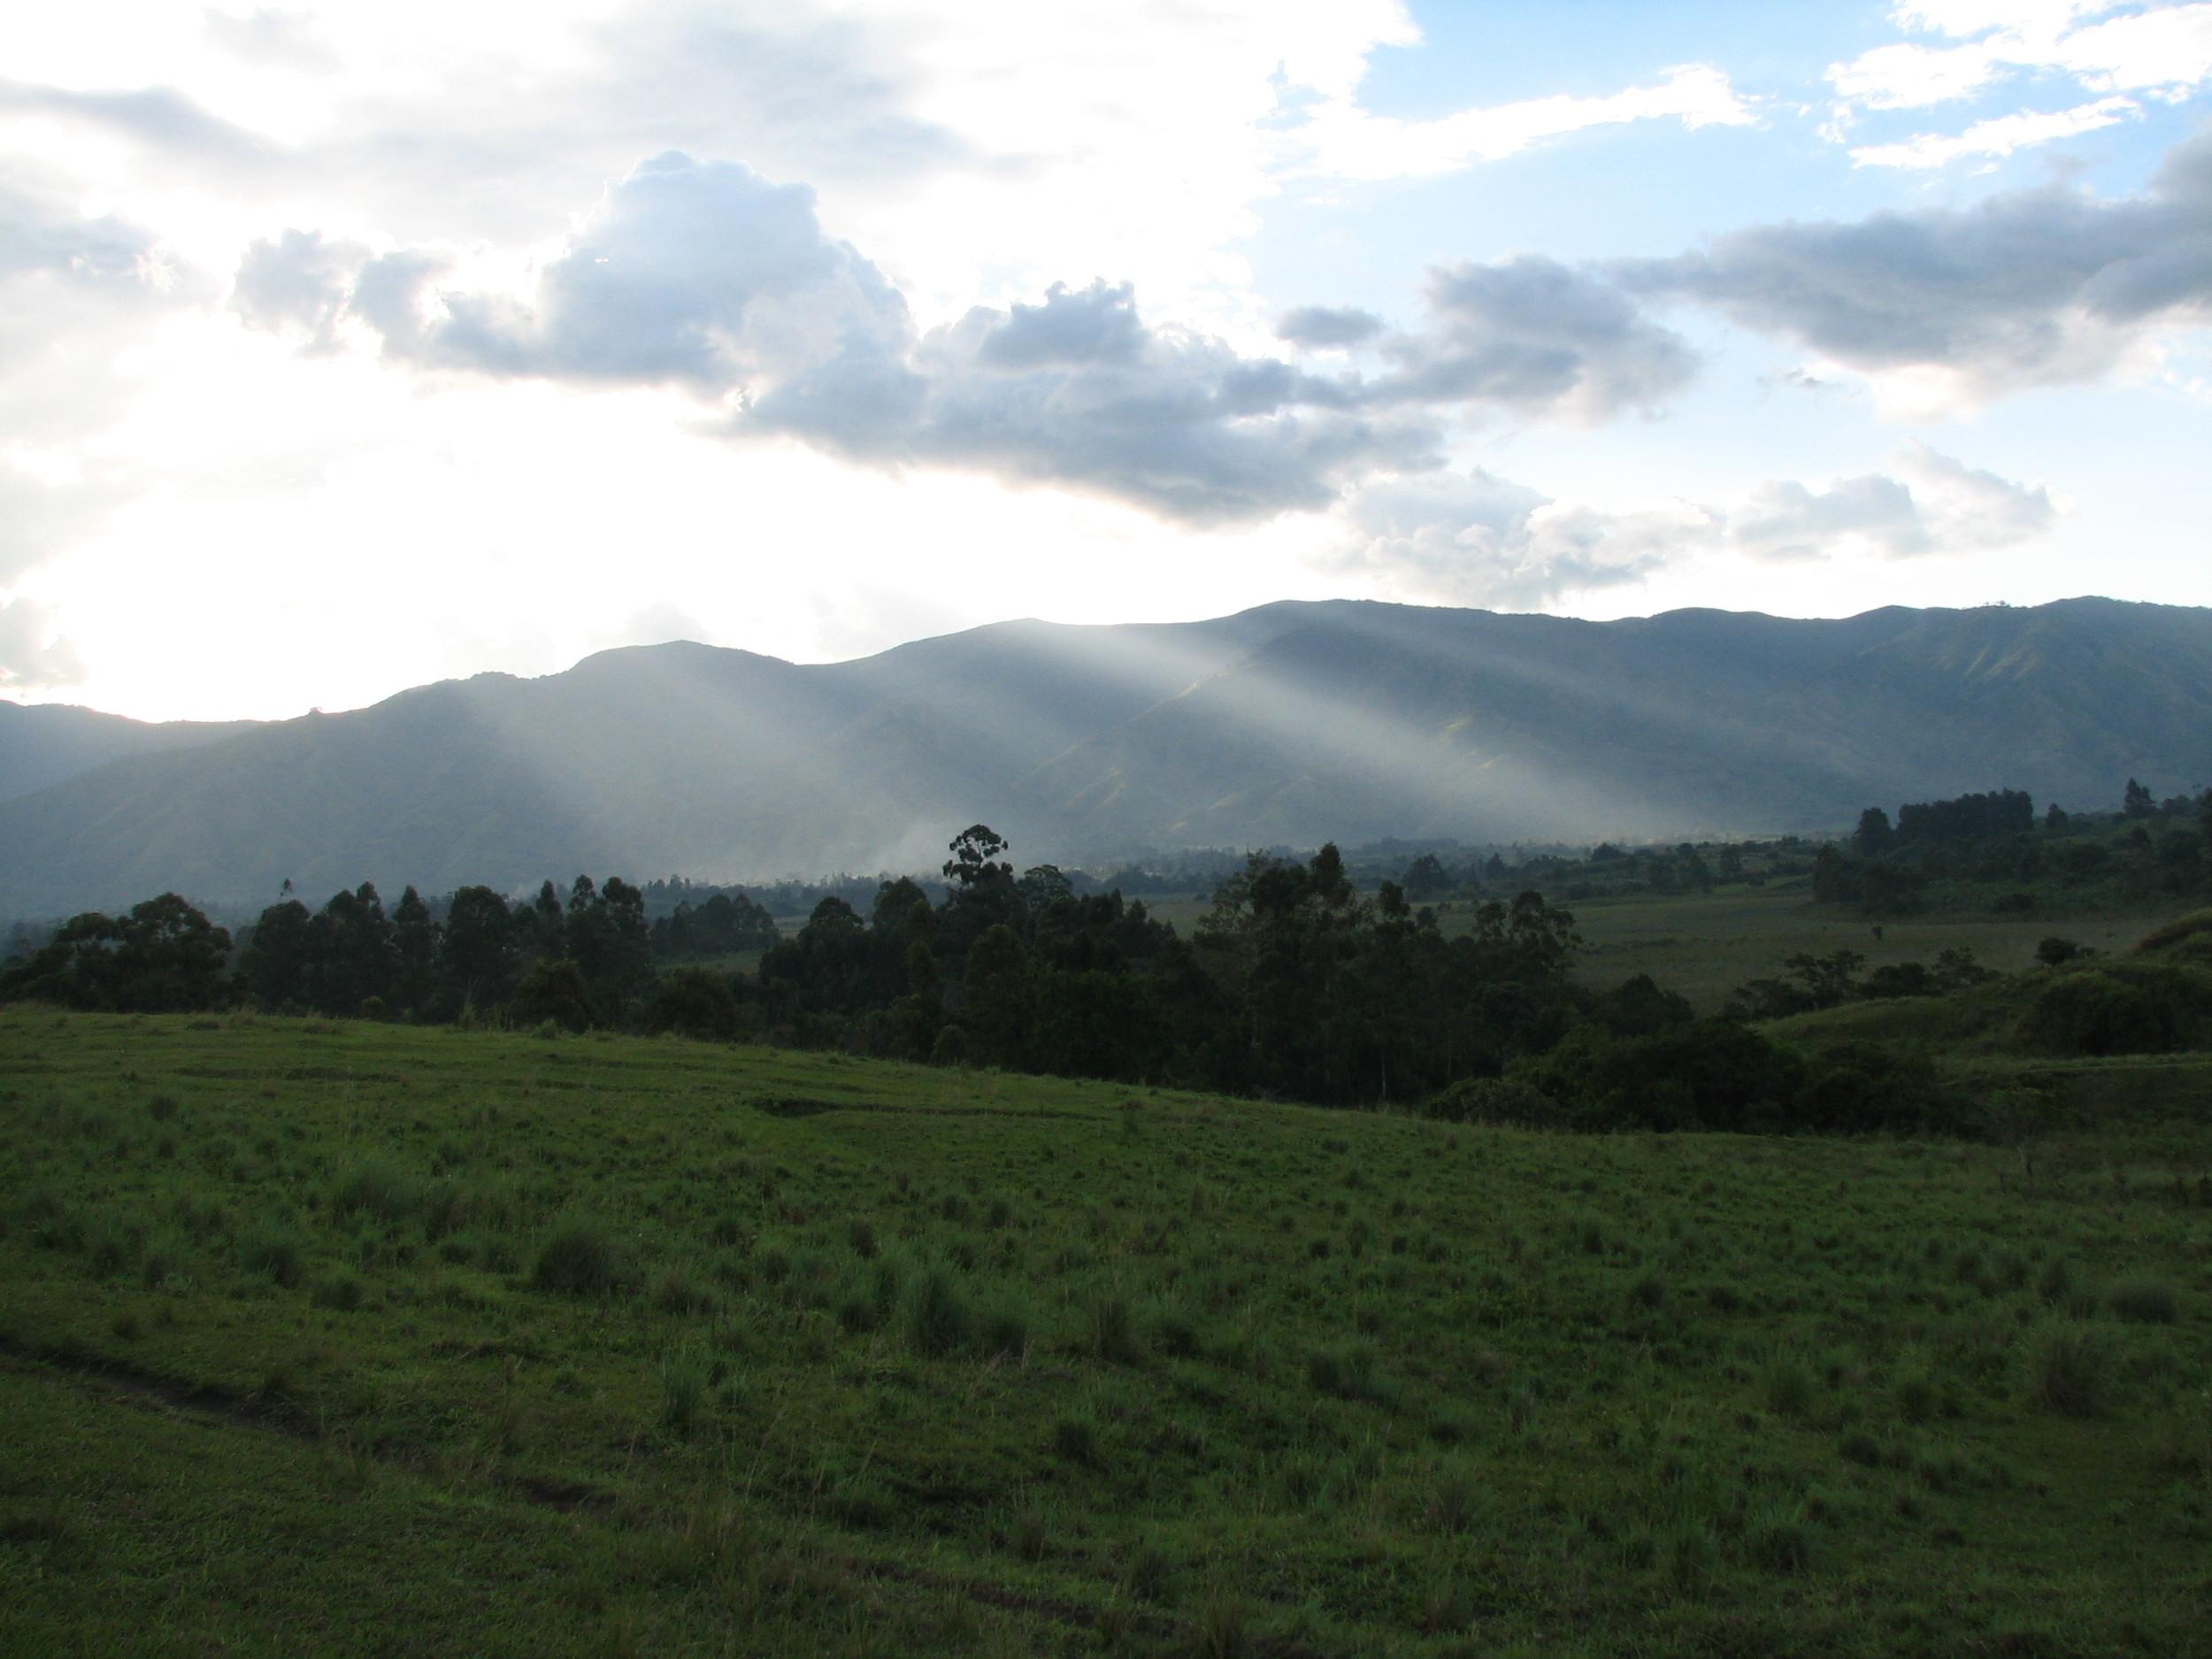 Rwenzori Foothills, Uganda